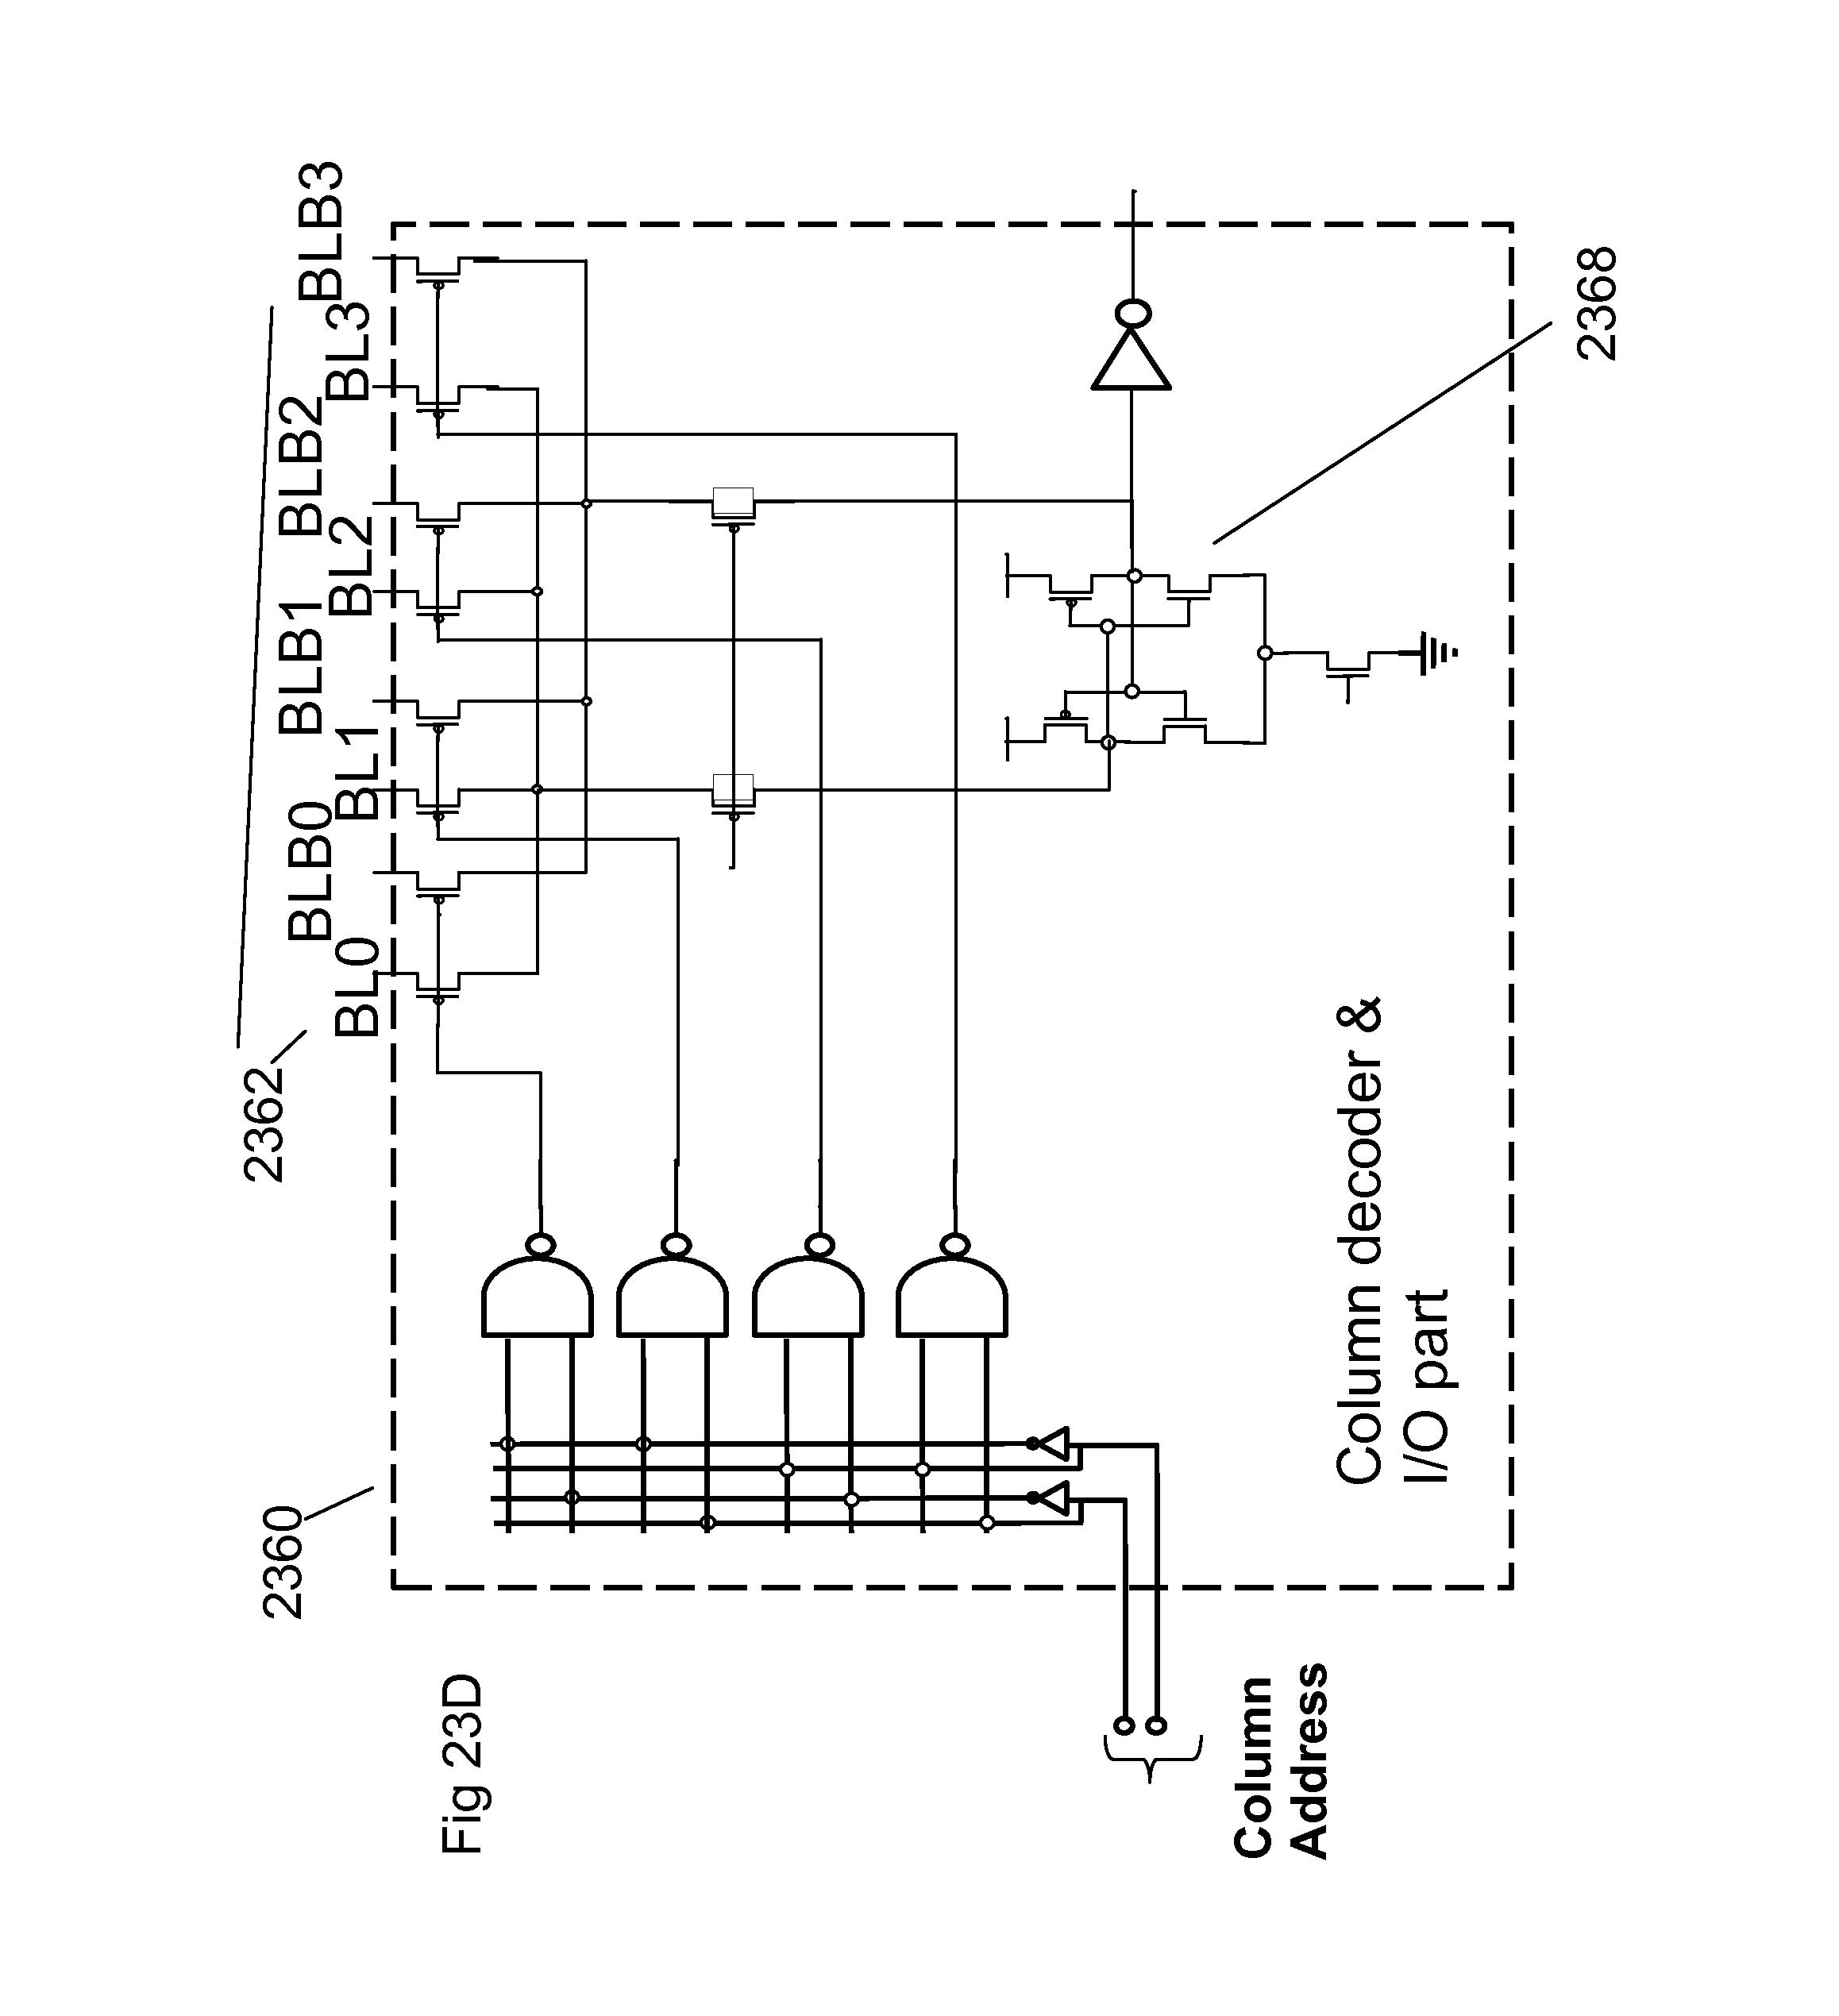 Patent Us 8846463 B1 Diodecoupled Flipflop Circuit Diagram Tradeoficcom Images